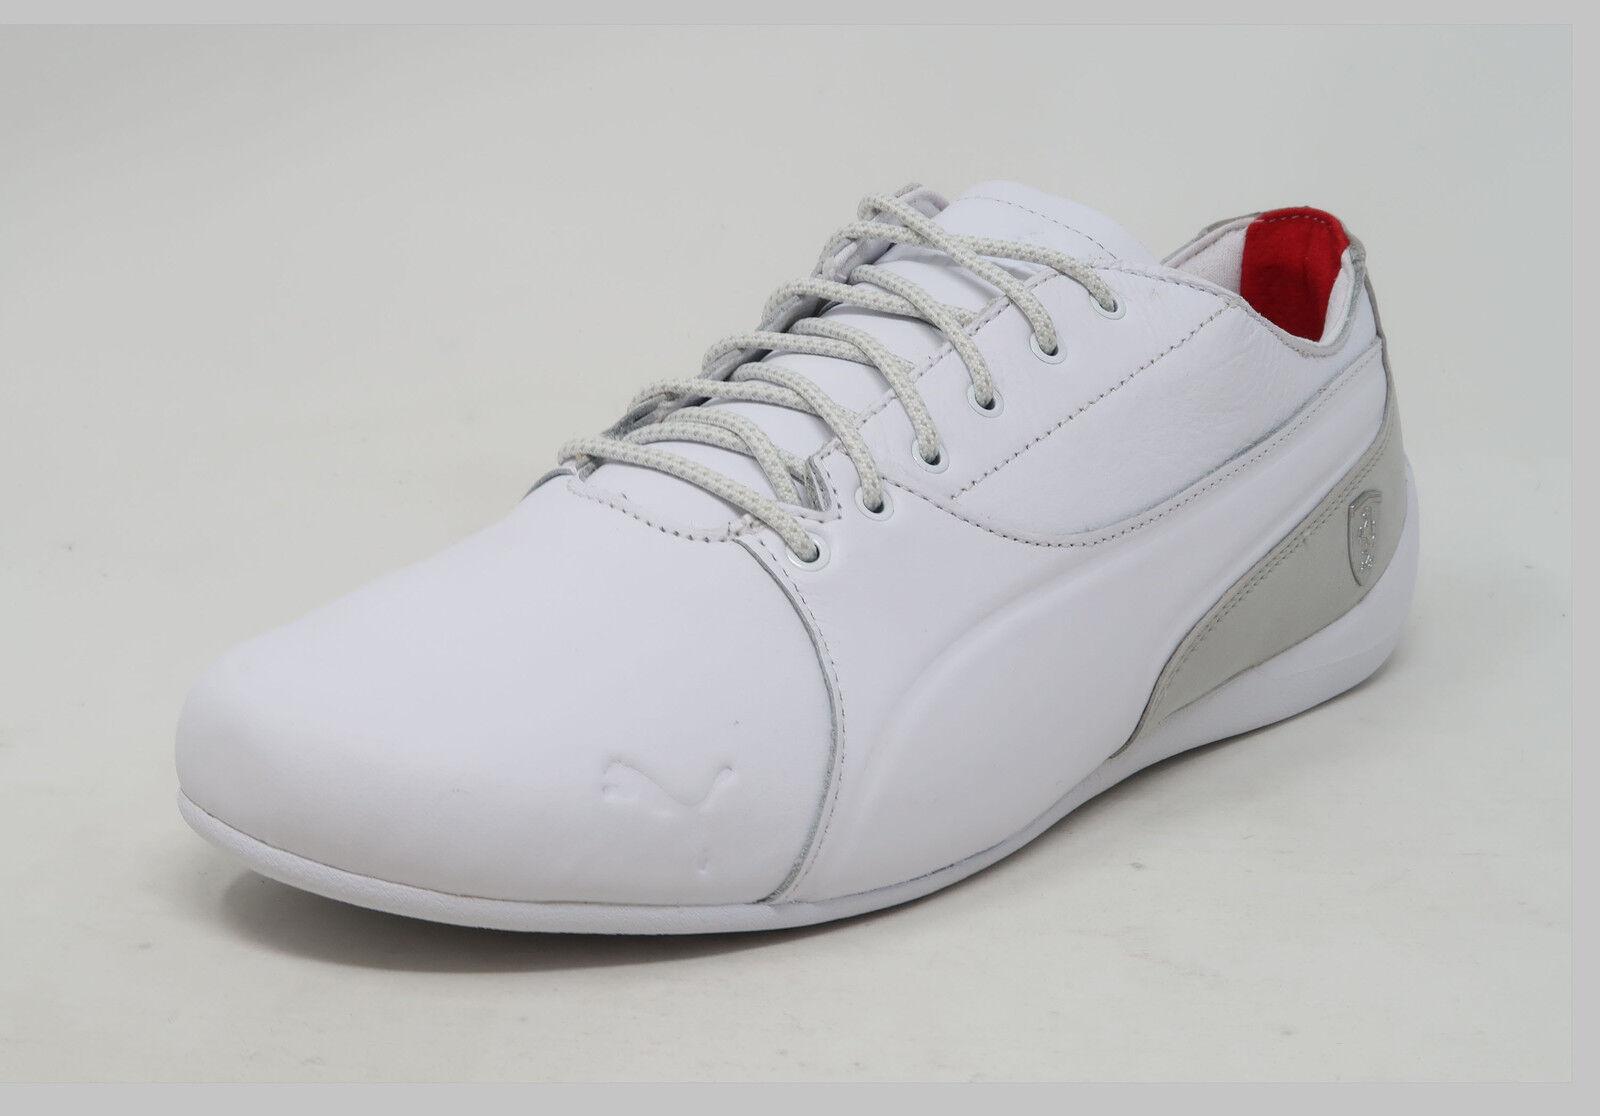 Cougar Moving CAT 7 ls Ferrari blanco gris cuero amarre calzado de moda